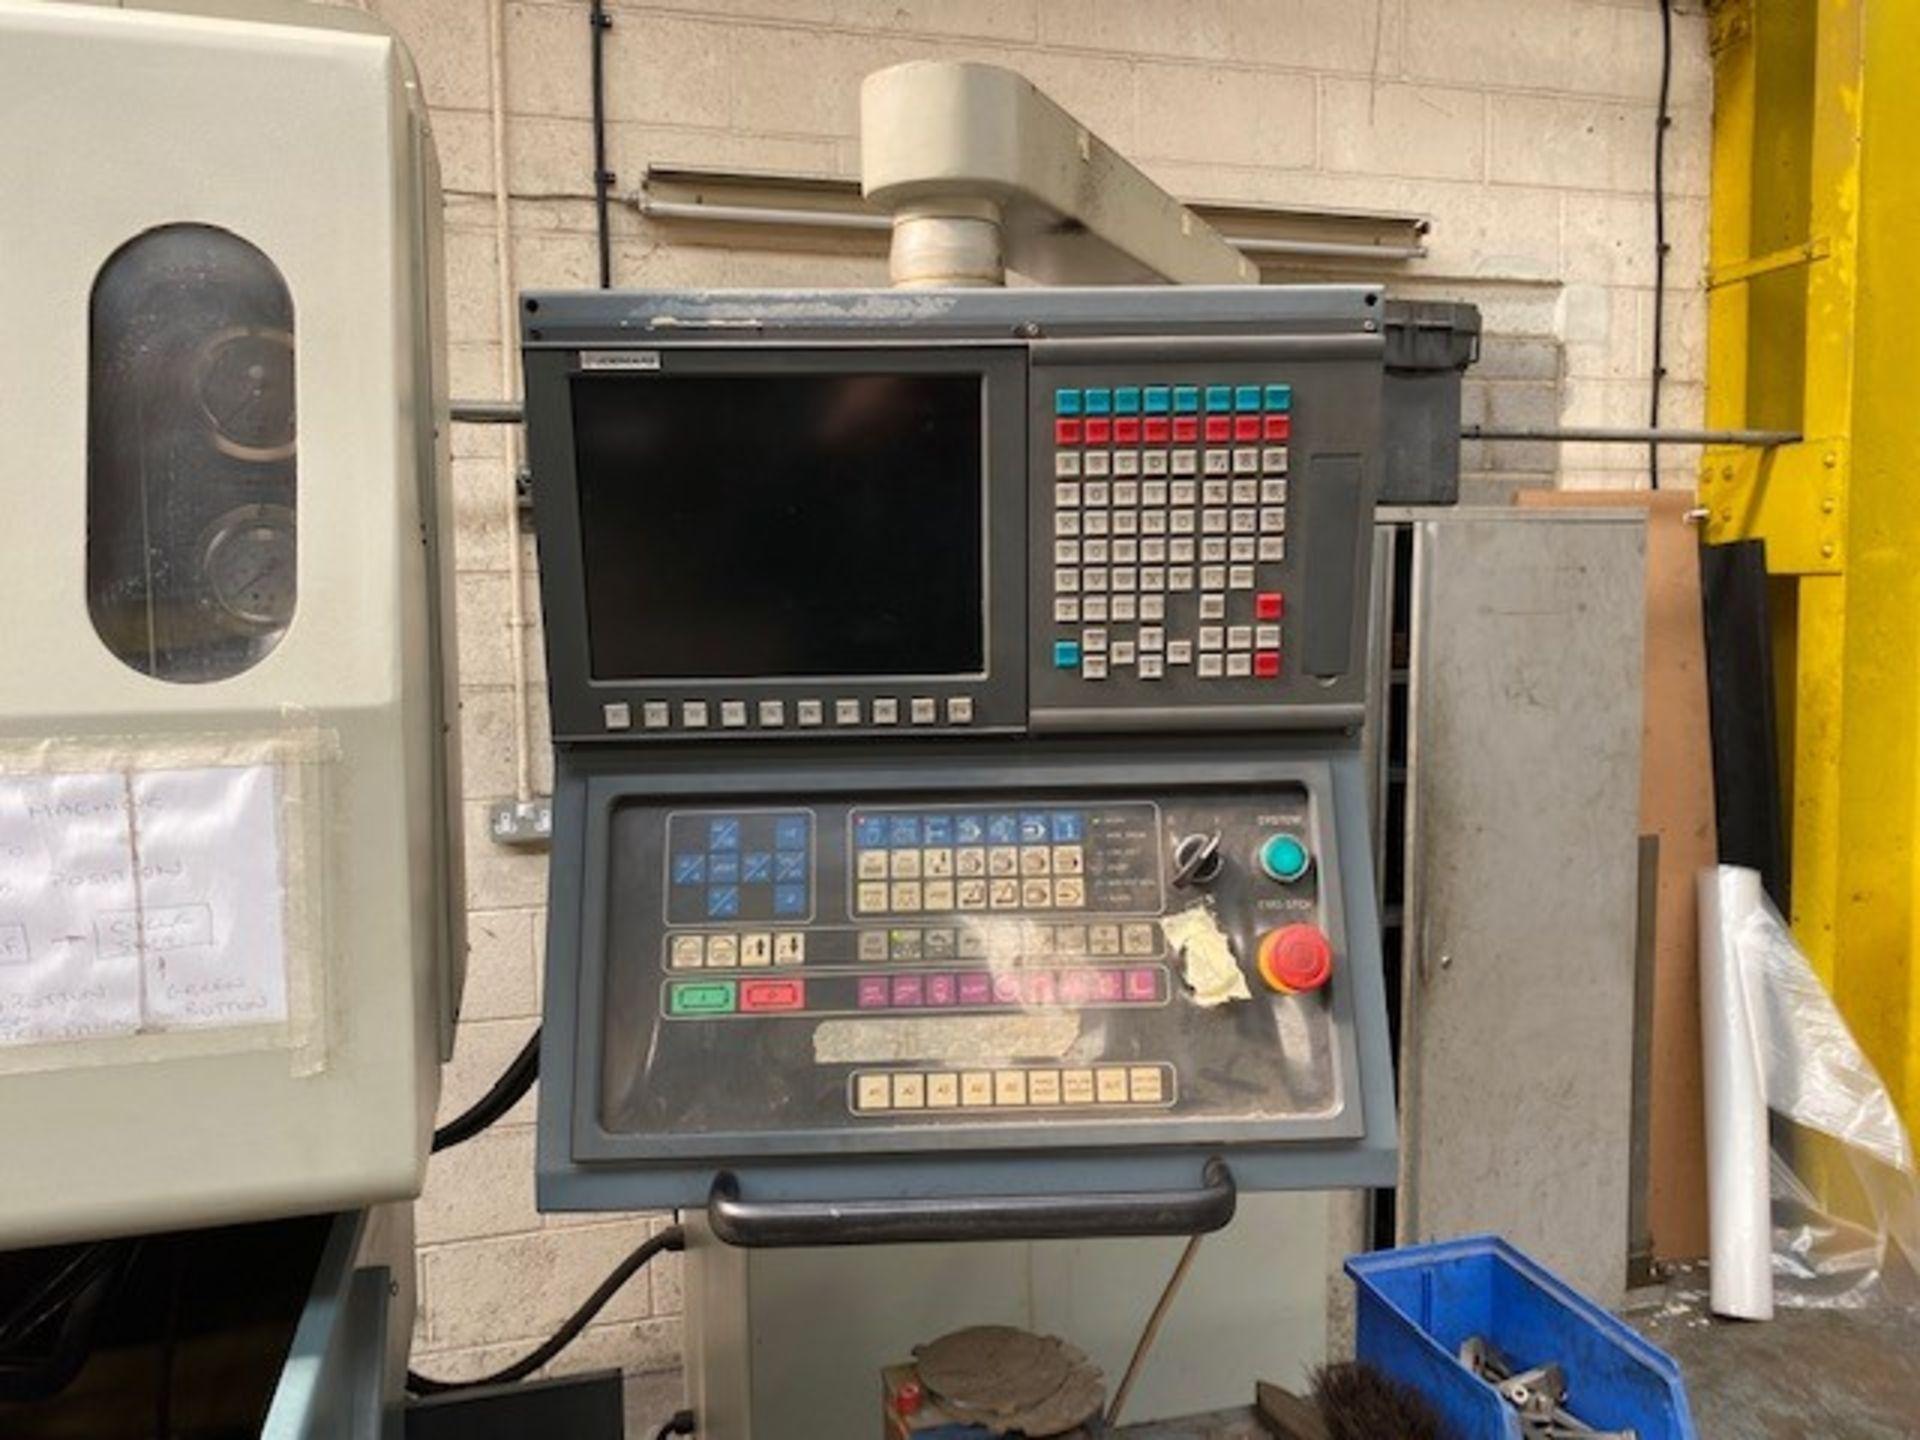 JOEMARS EURO SPARK EROSION CNC/EDM MACHINE WITH JOEMARS AL-5 CONTROLLER AND HABOR CHILLER TANK - Image 2 of 2